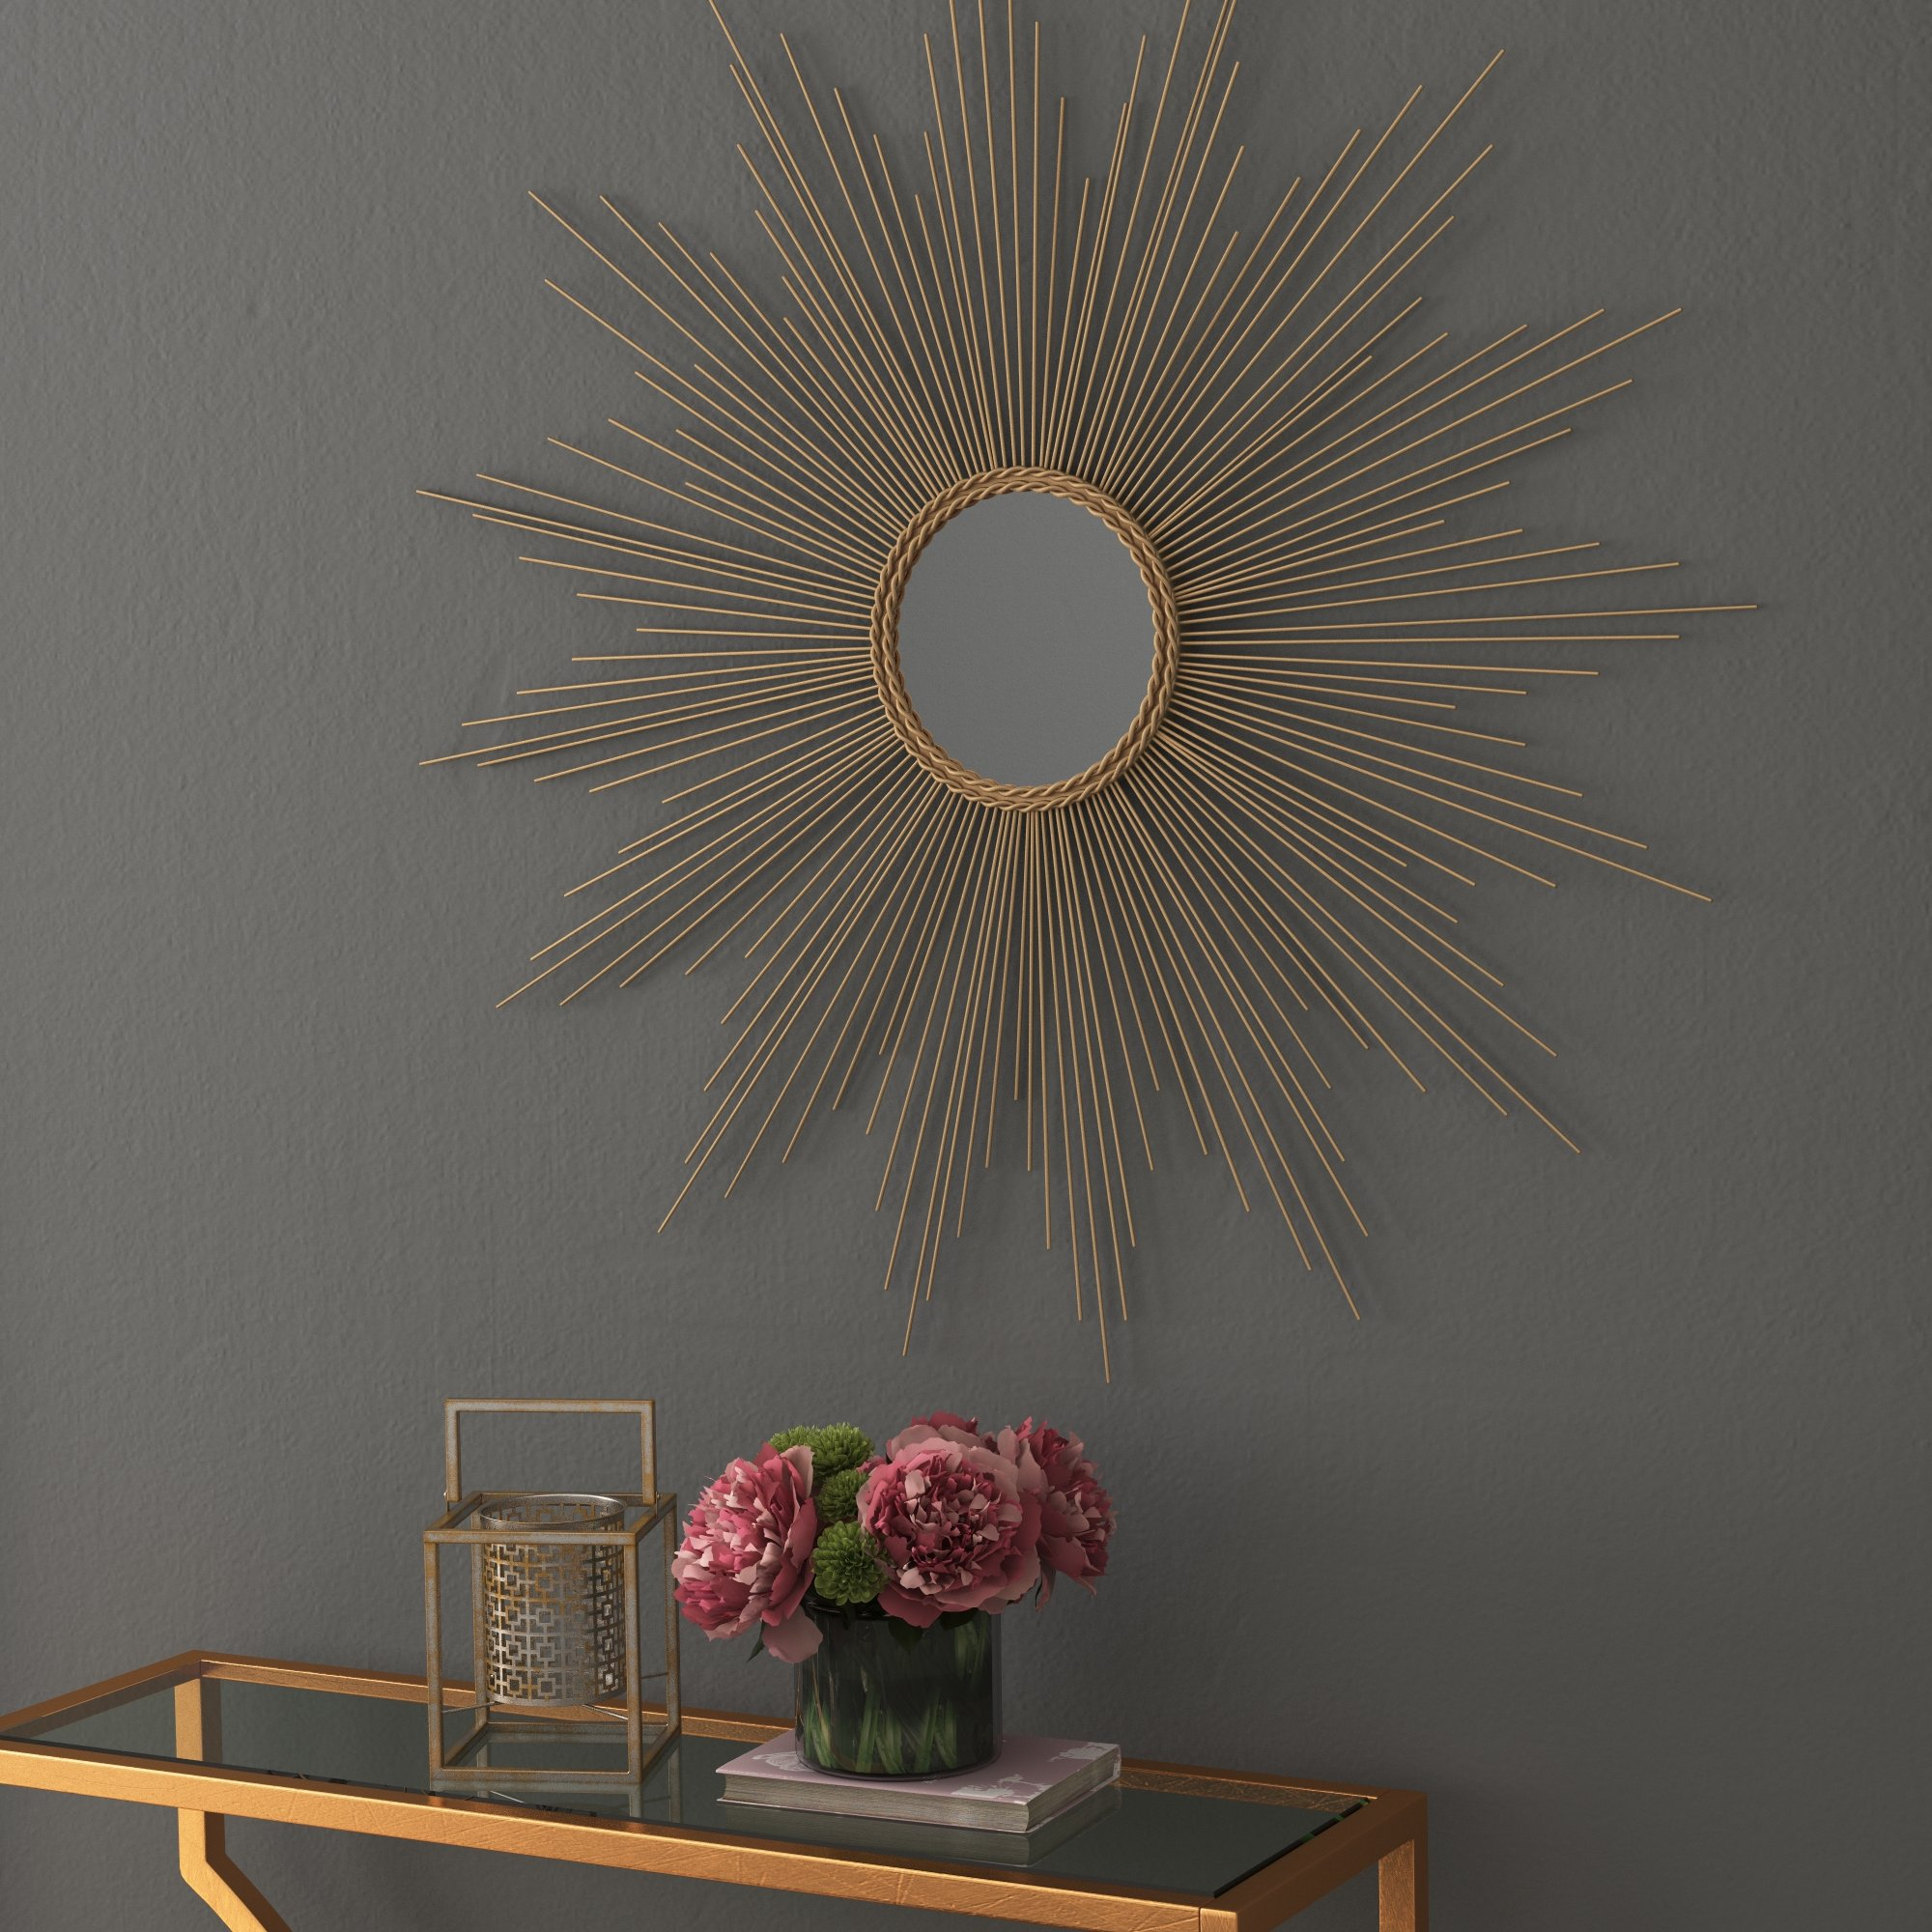 Modern Sunburst Mirrors | Allmodern With Regard To Estrela Modern Sunburst Metal Wall Mirrors (View 16 of 30)